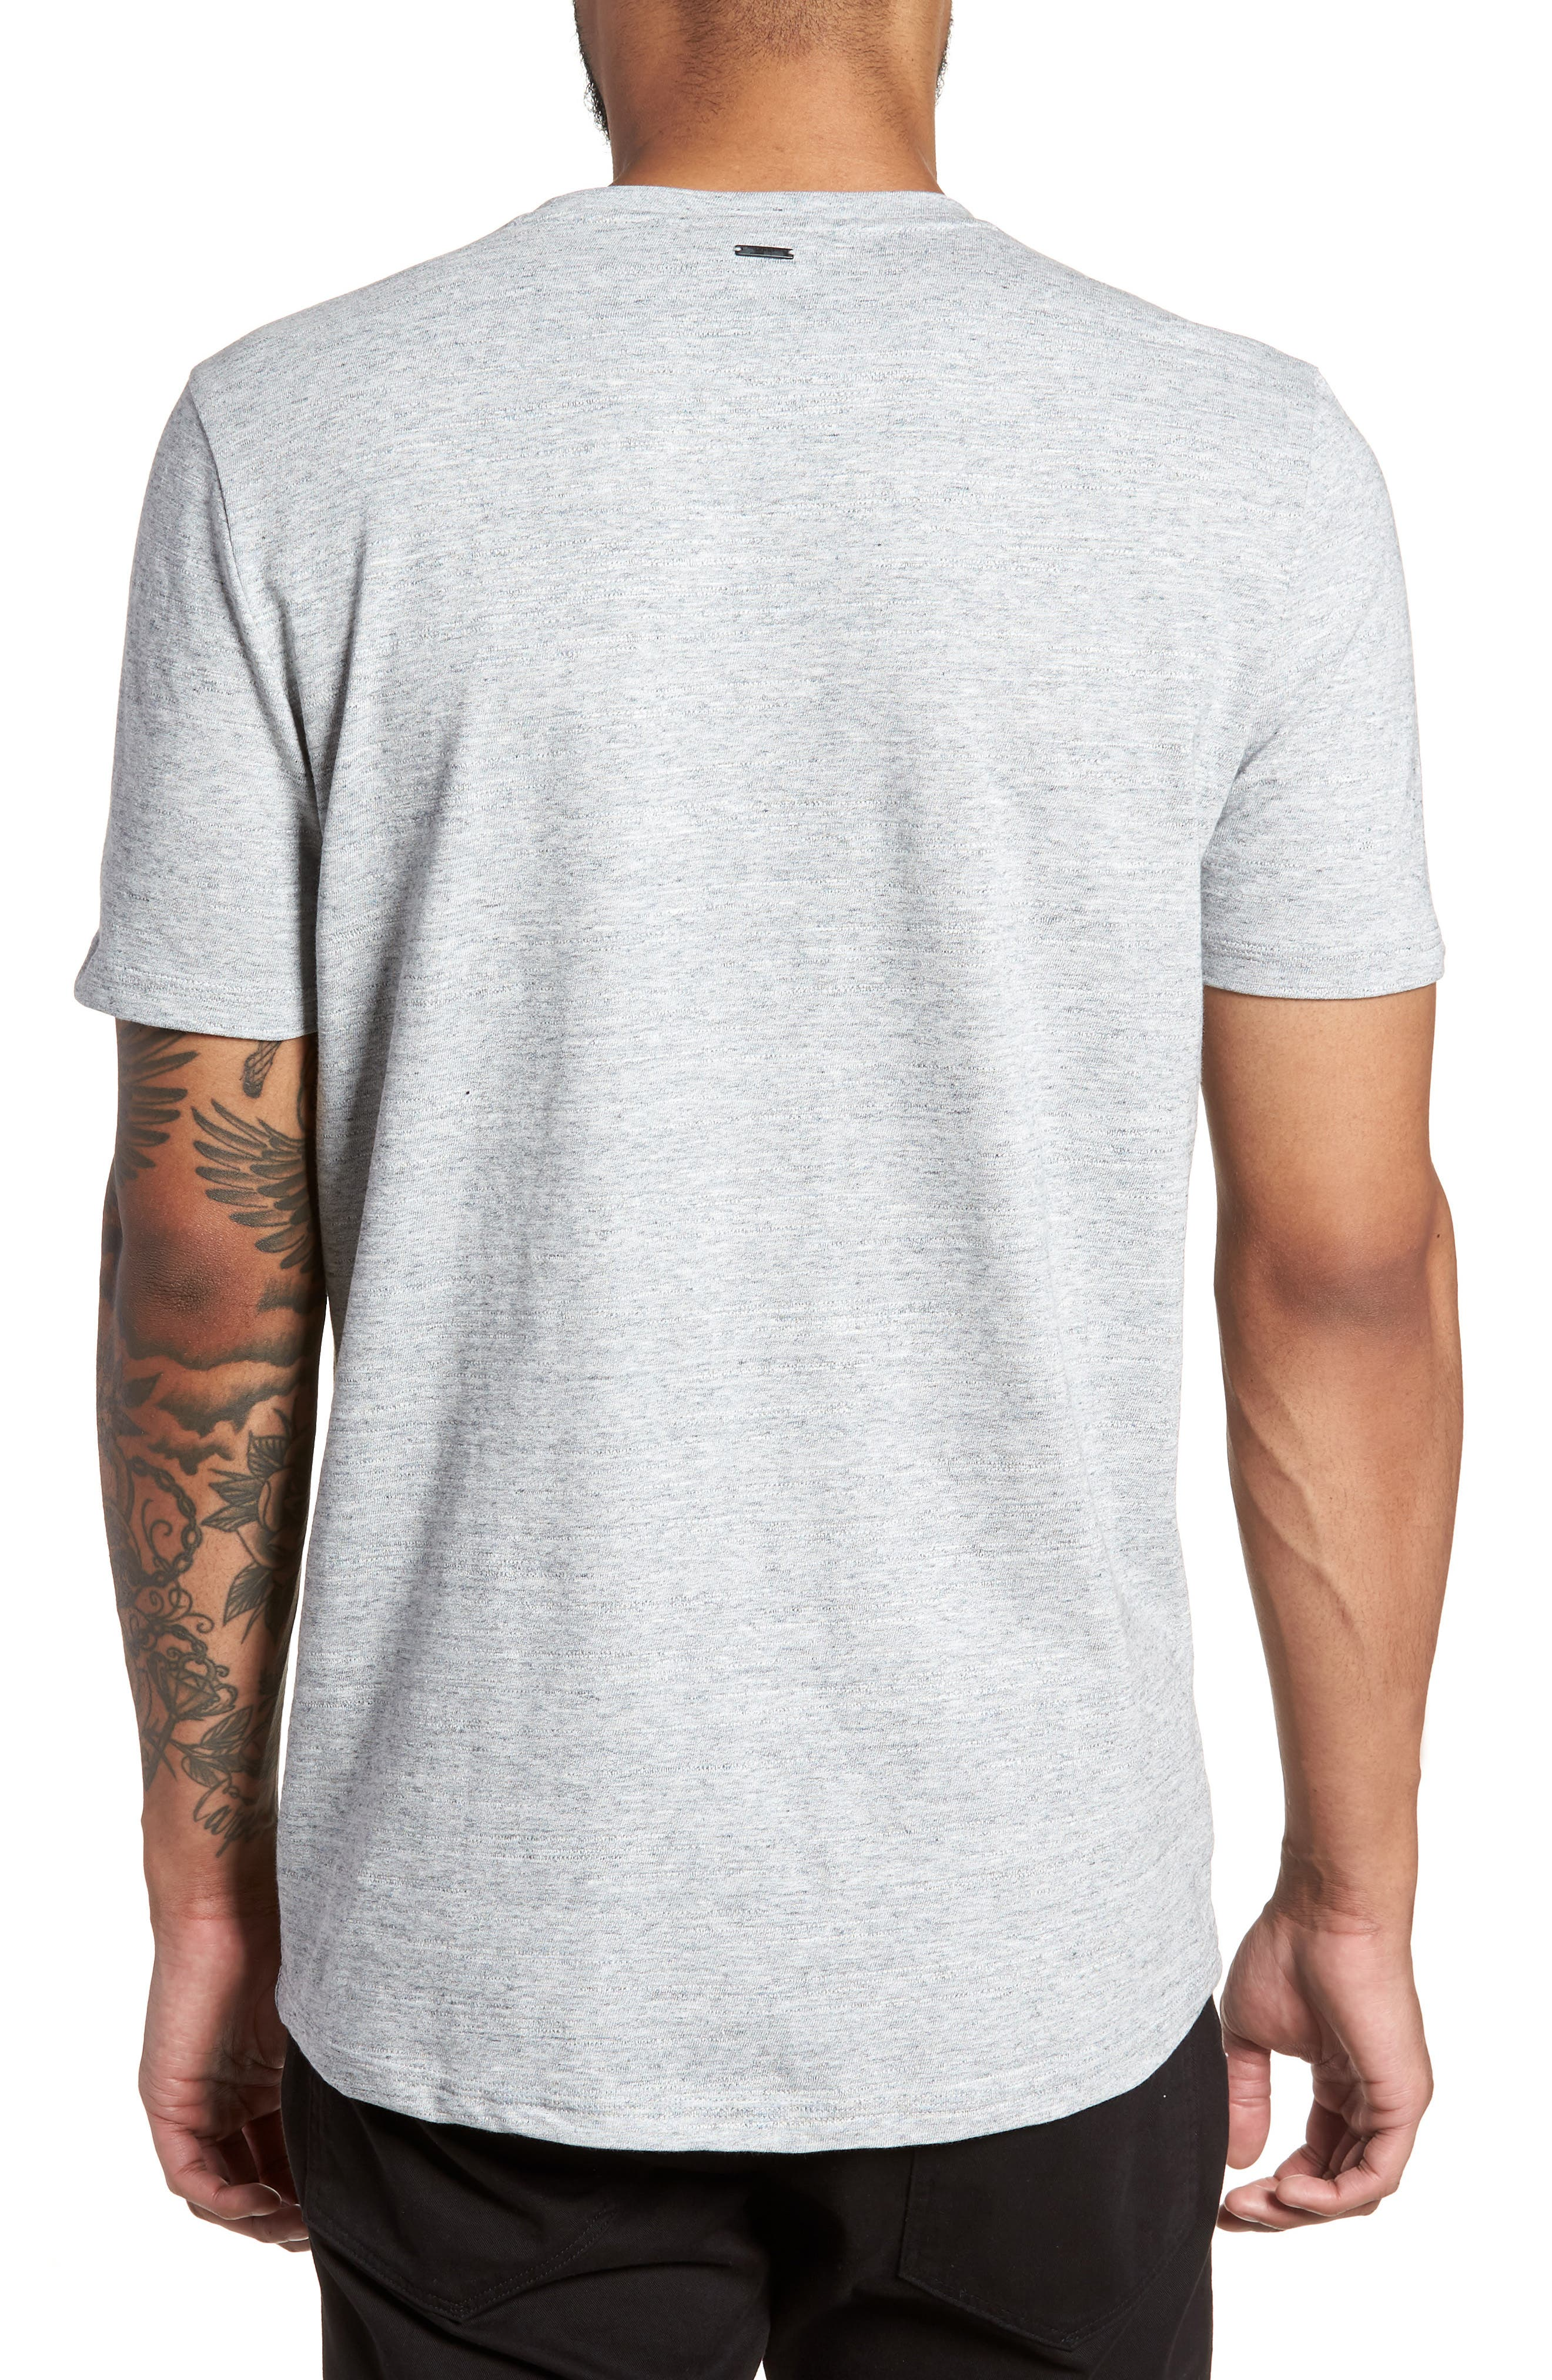 Dohnny Crewneck T-Shirt,                             Alternate thumbnail 2, color,                             061